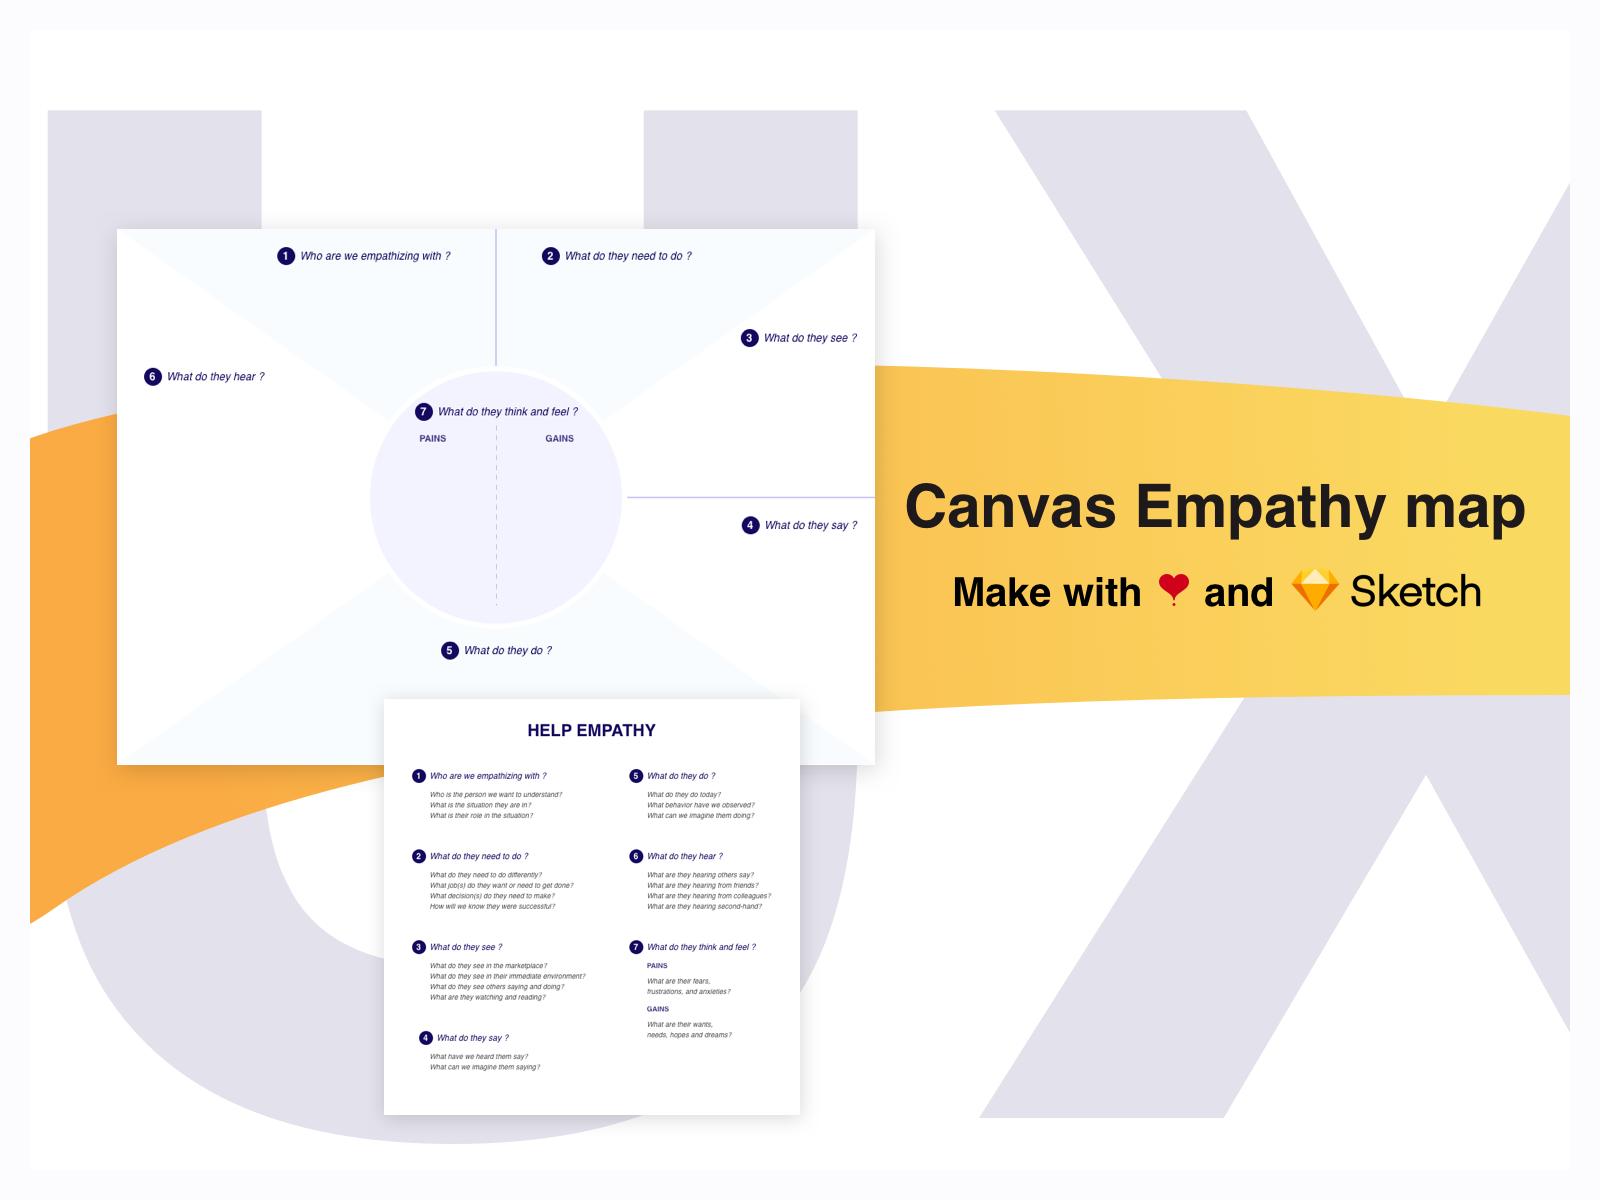 Freebie ux template canvas empathy map by gabriel avdikian dribbble dribbble empathy 4x maxwellsz